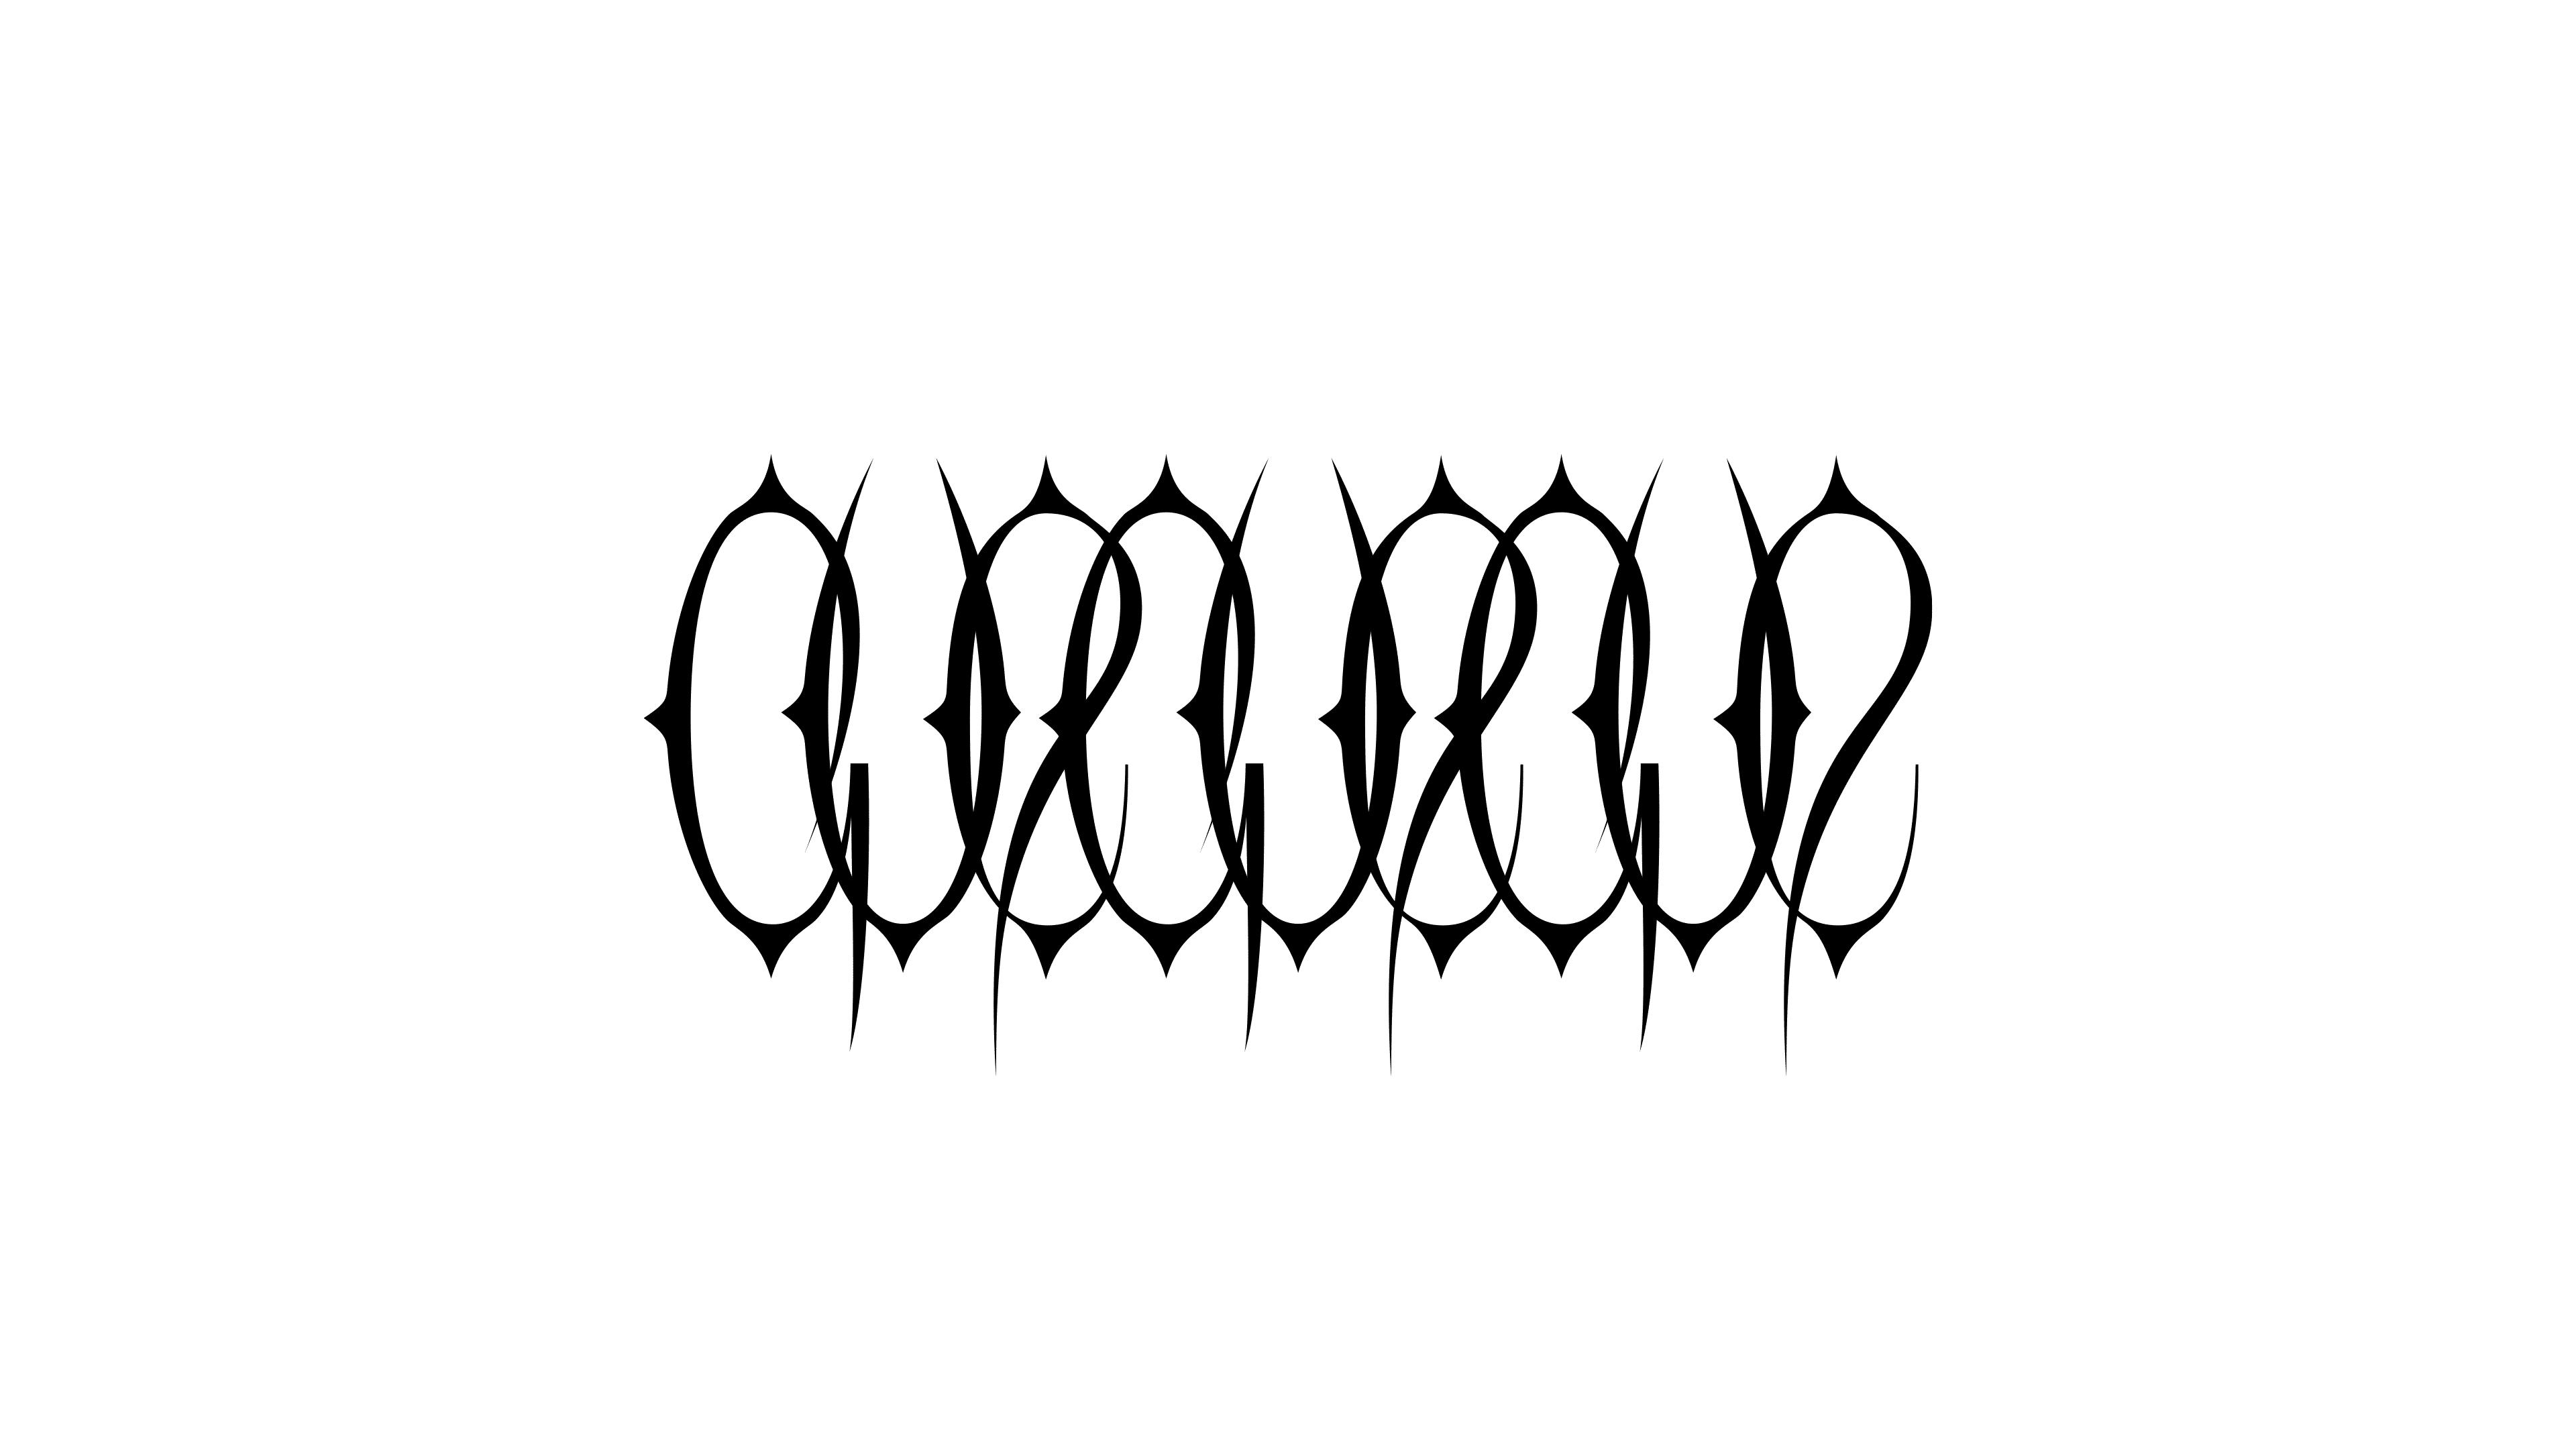 GUE-PEQUENO-SINATRA-merch-graphics-gue-01